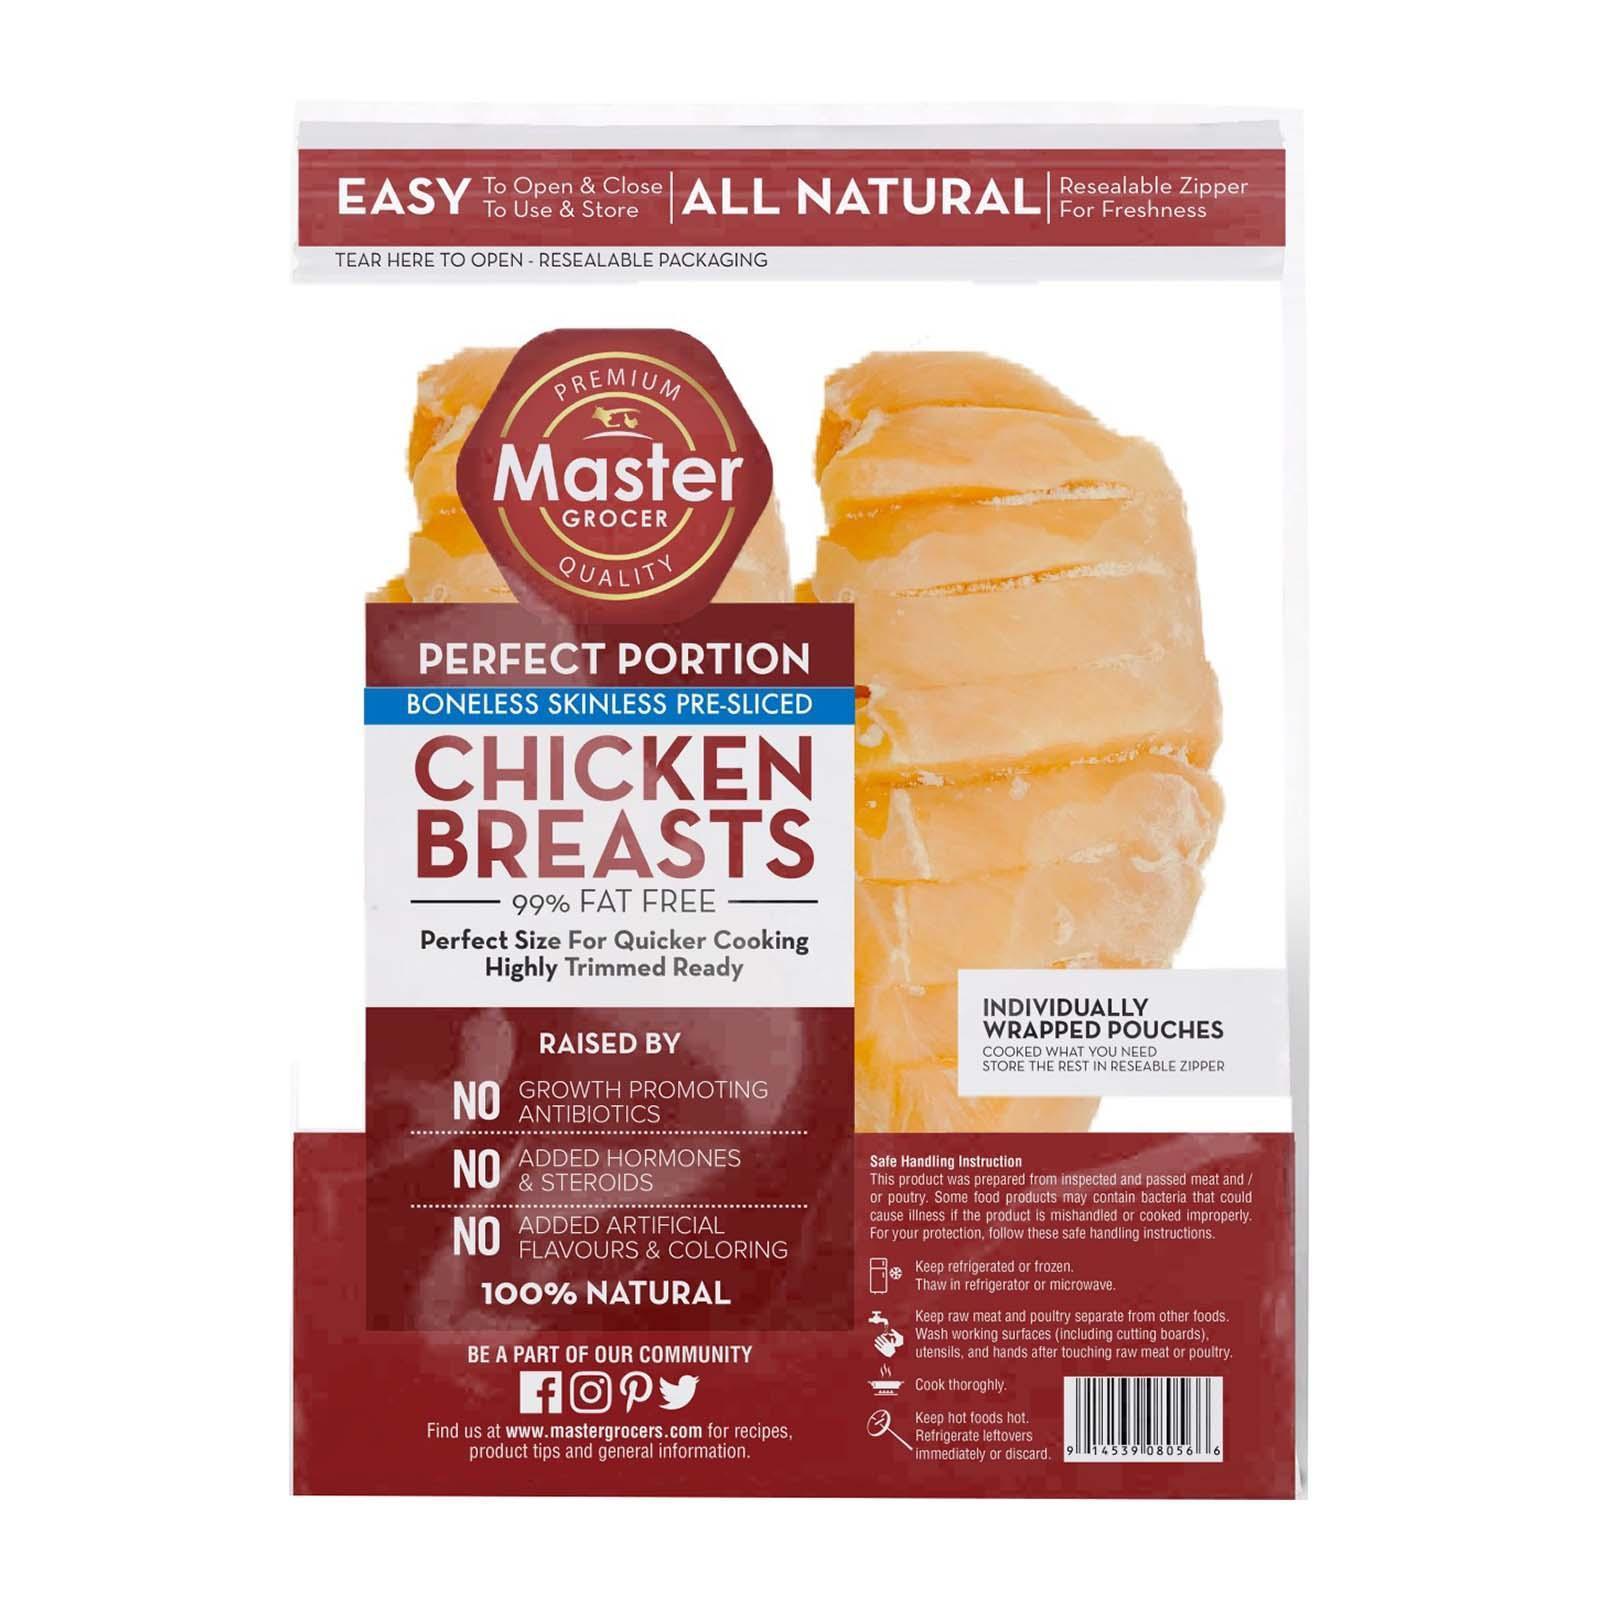 Master Grocer 99% Fat Free Chicken Breast Skinless Pre-Sliced - Frozen